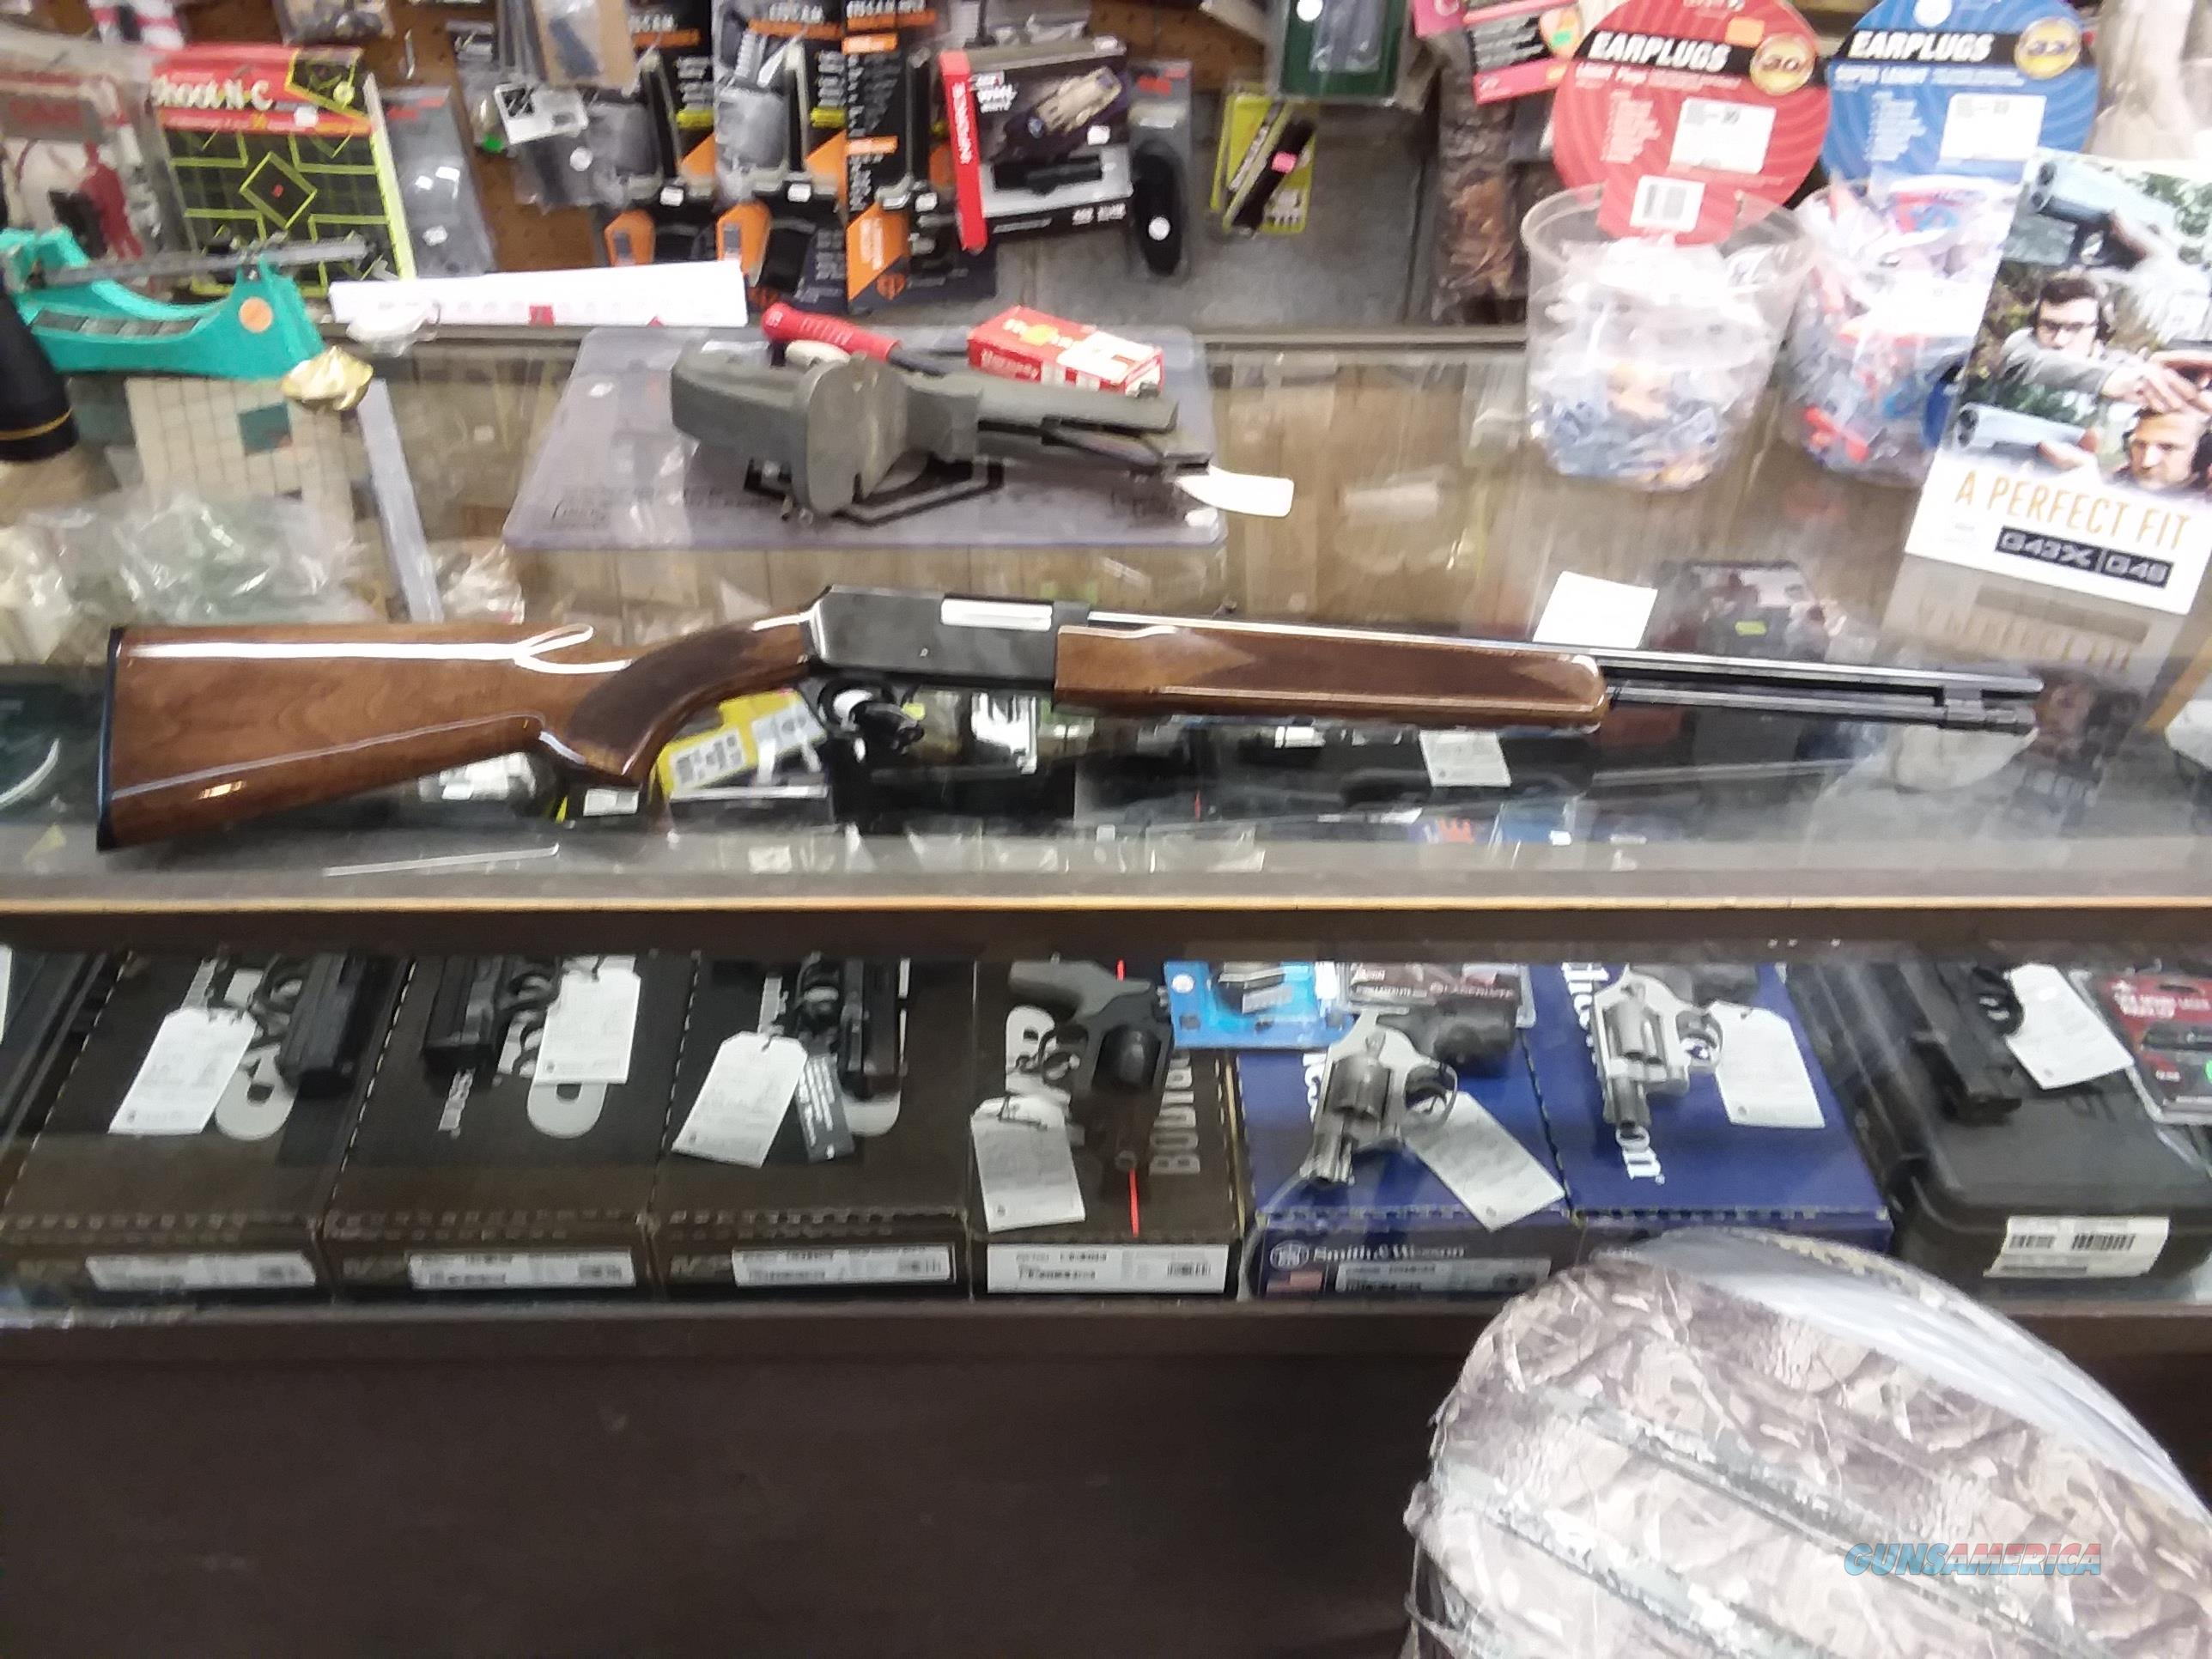 BROWNING BPR 22 RIFLE  Guns > Rifles > Browning Rifles > Pump Action